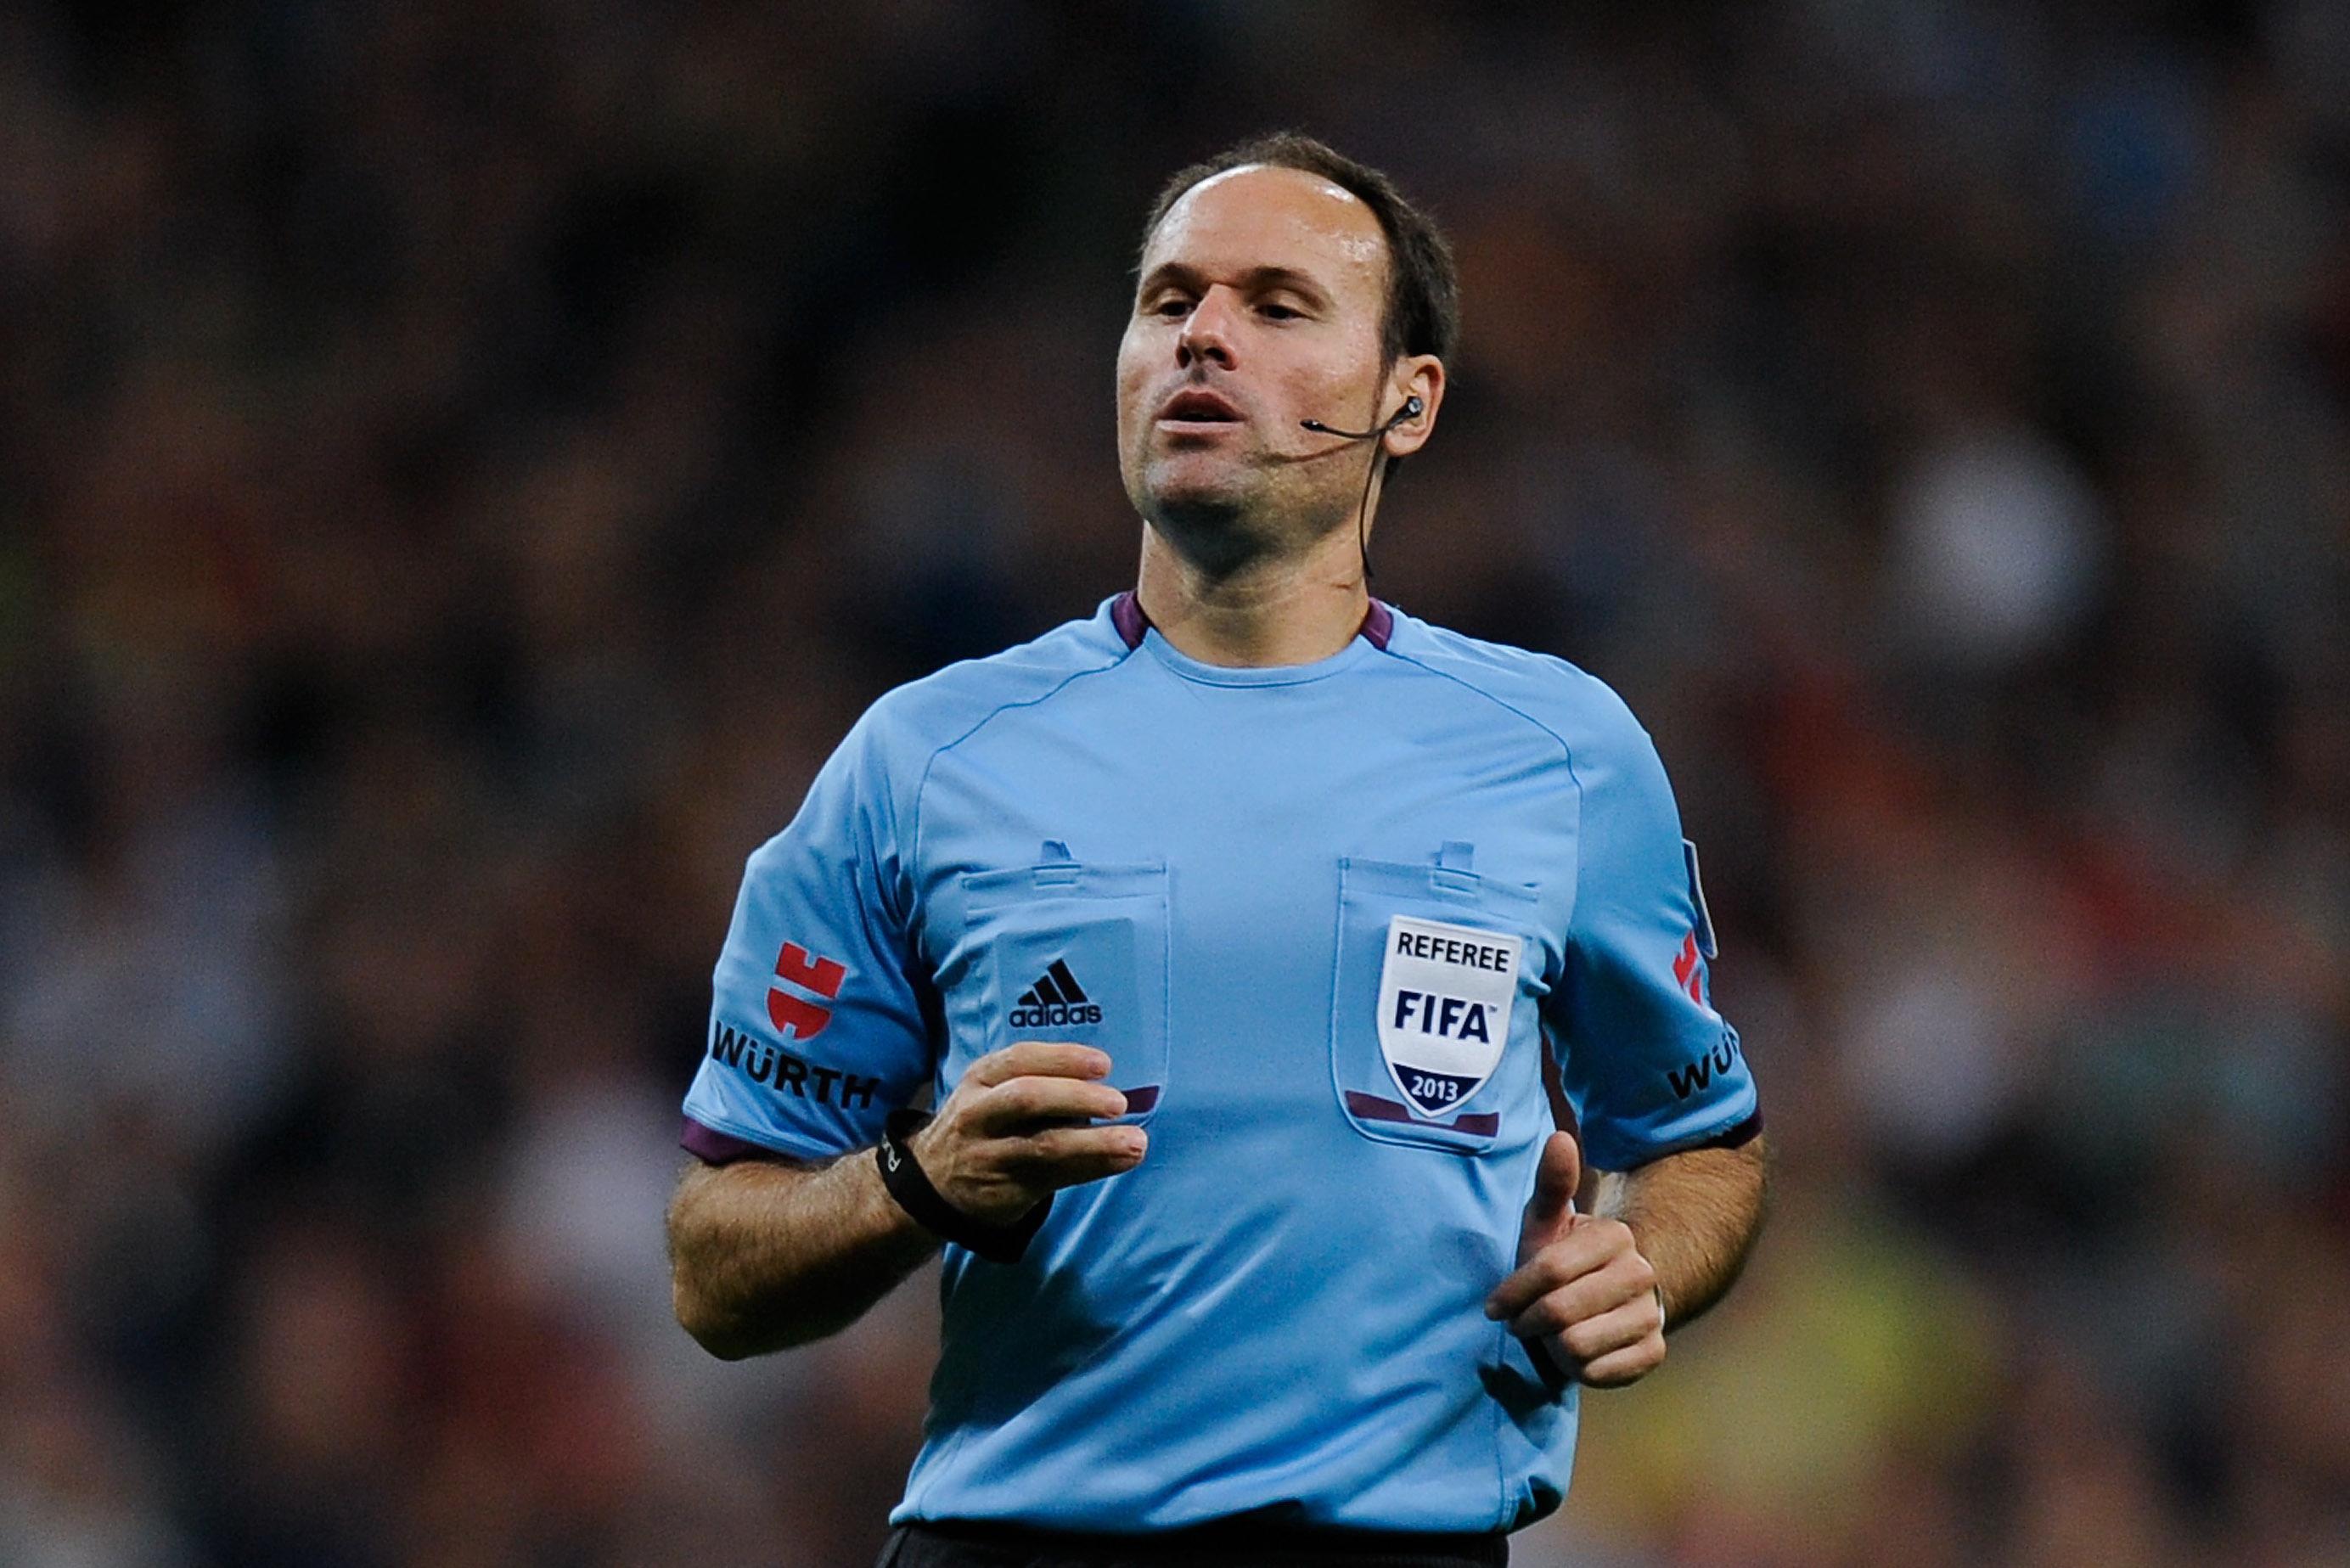 Mateu Lahoz - Referee - Liga BBVA - Spain